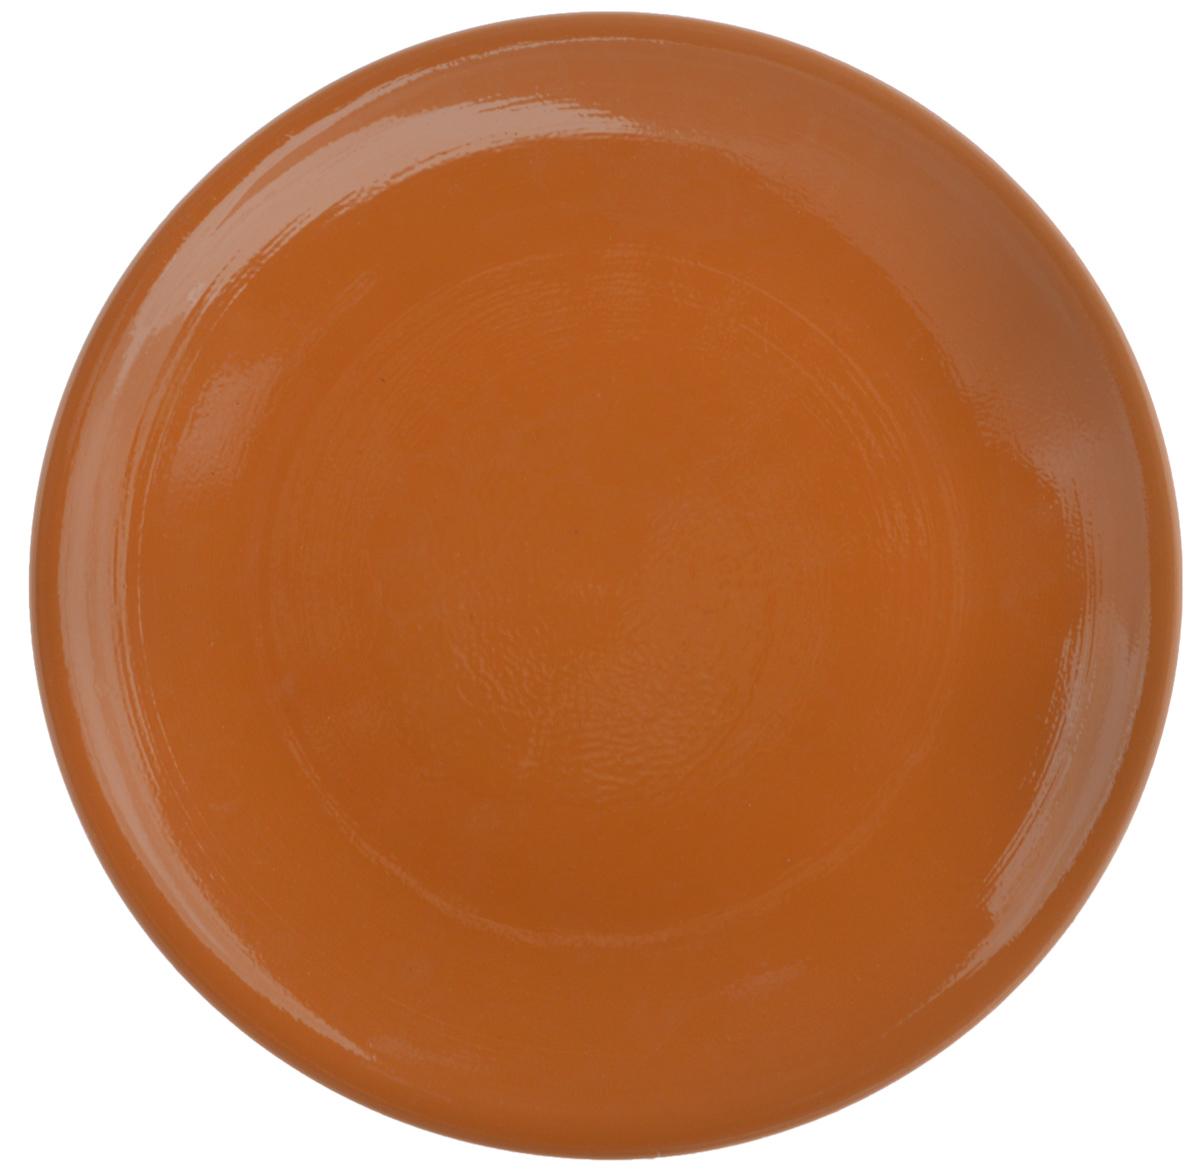 "Тарелка Борисовская керамика ""Cтандарт"", цвет: коричневый, диаметр 23 см"